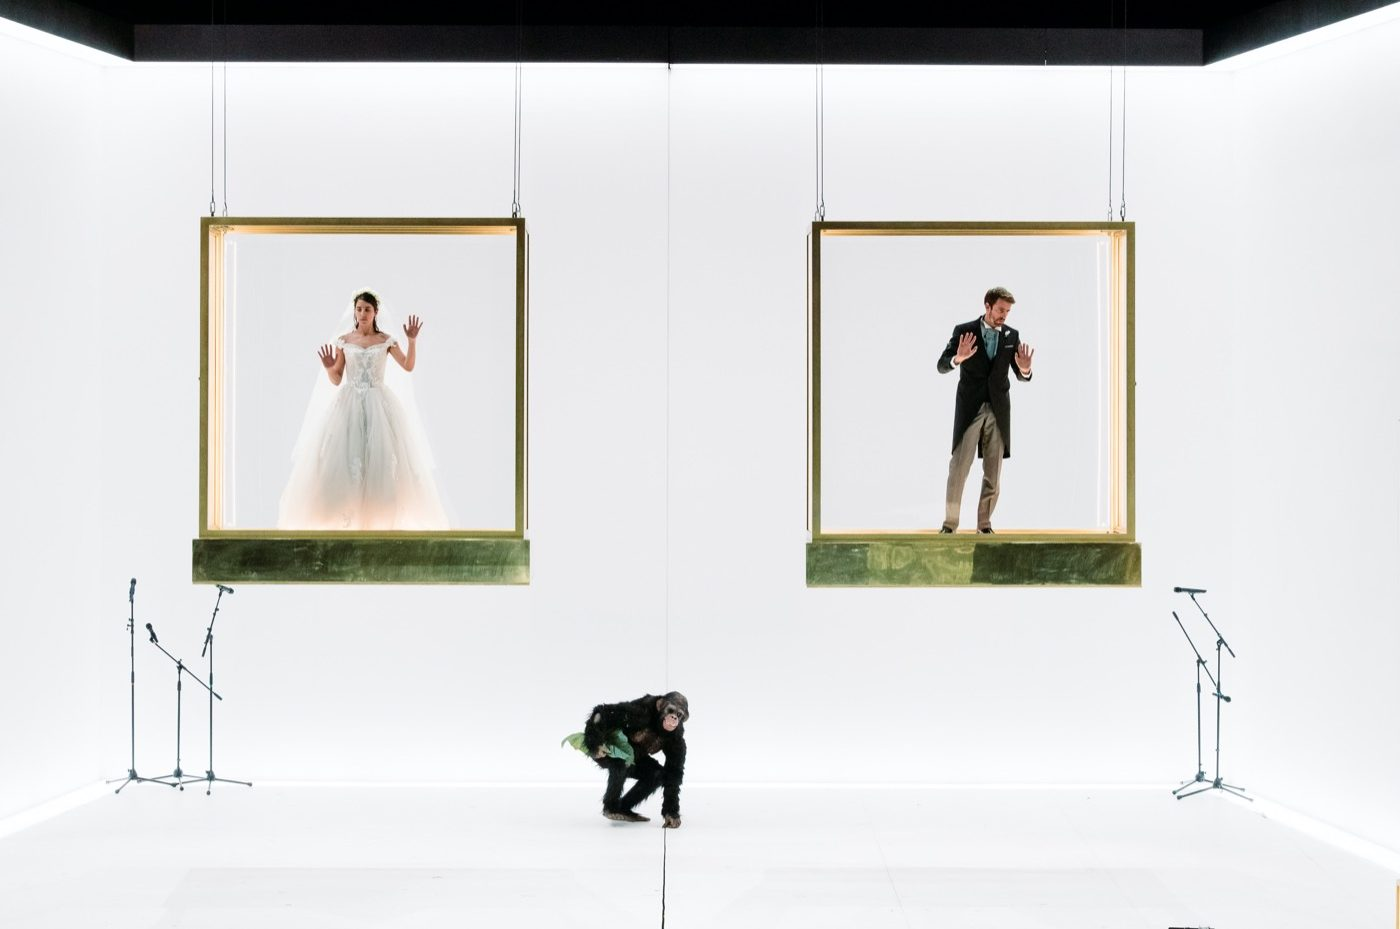 Paolo-Fantin-Damiano-Michieletto-Beatrice-et-Benedict-Blandine-Soulage-01100.jpg